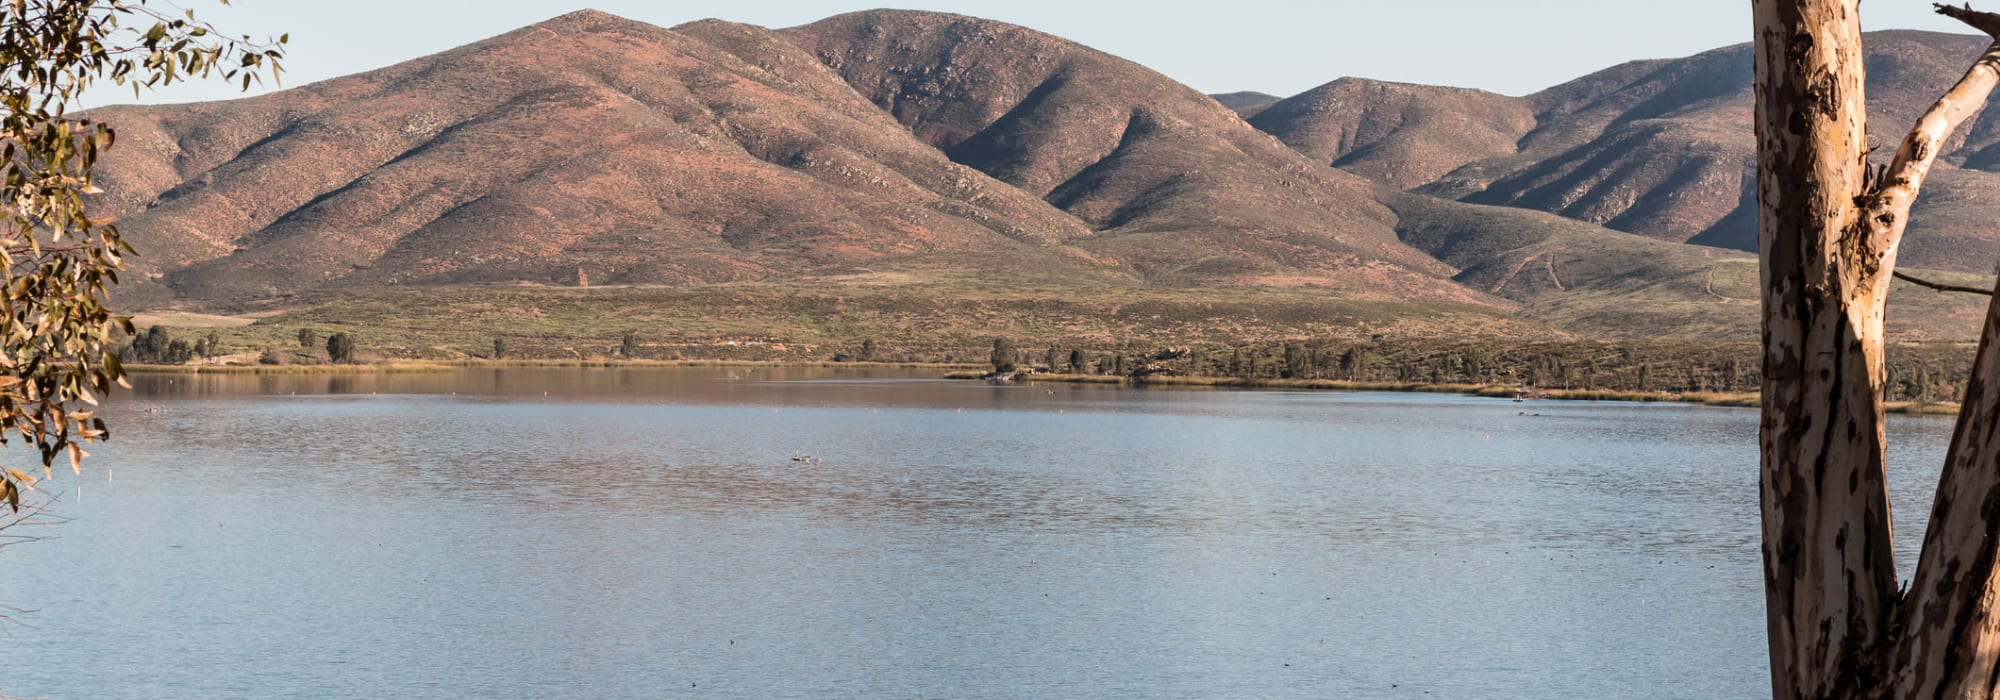 Lower Otay Lake near Smart Self Storage of Eastlake in Chula Vista, California